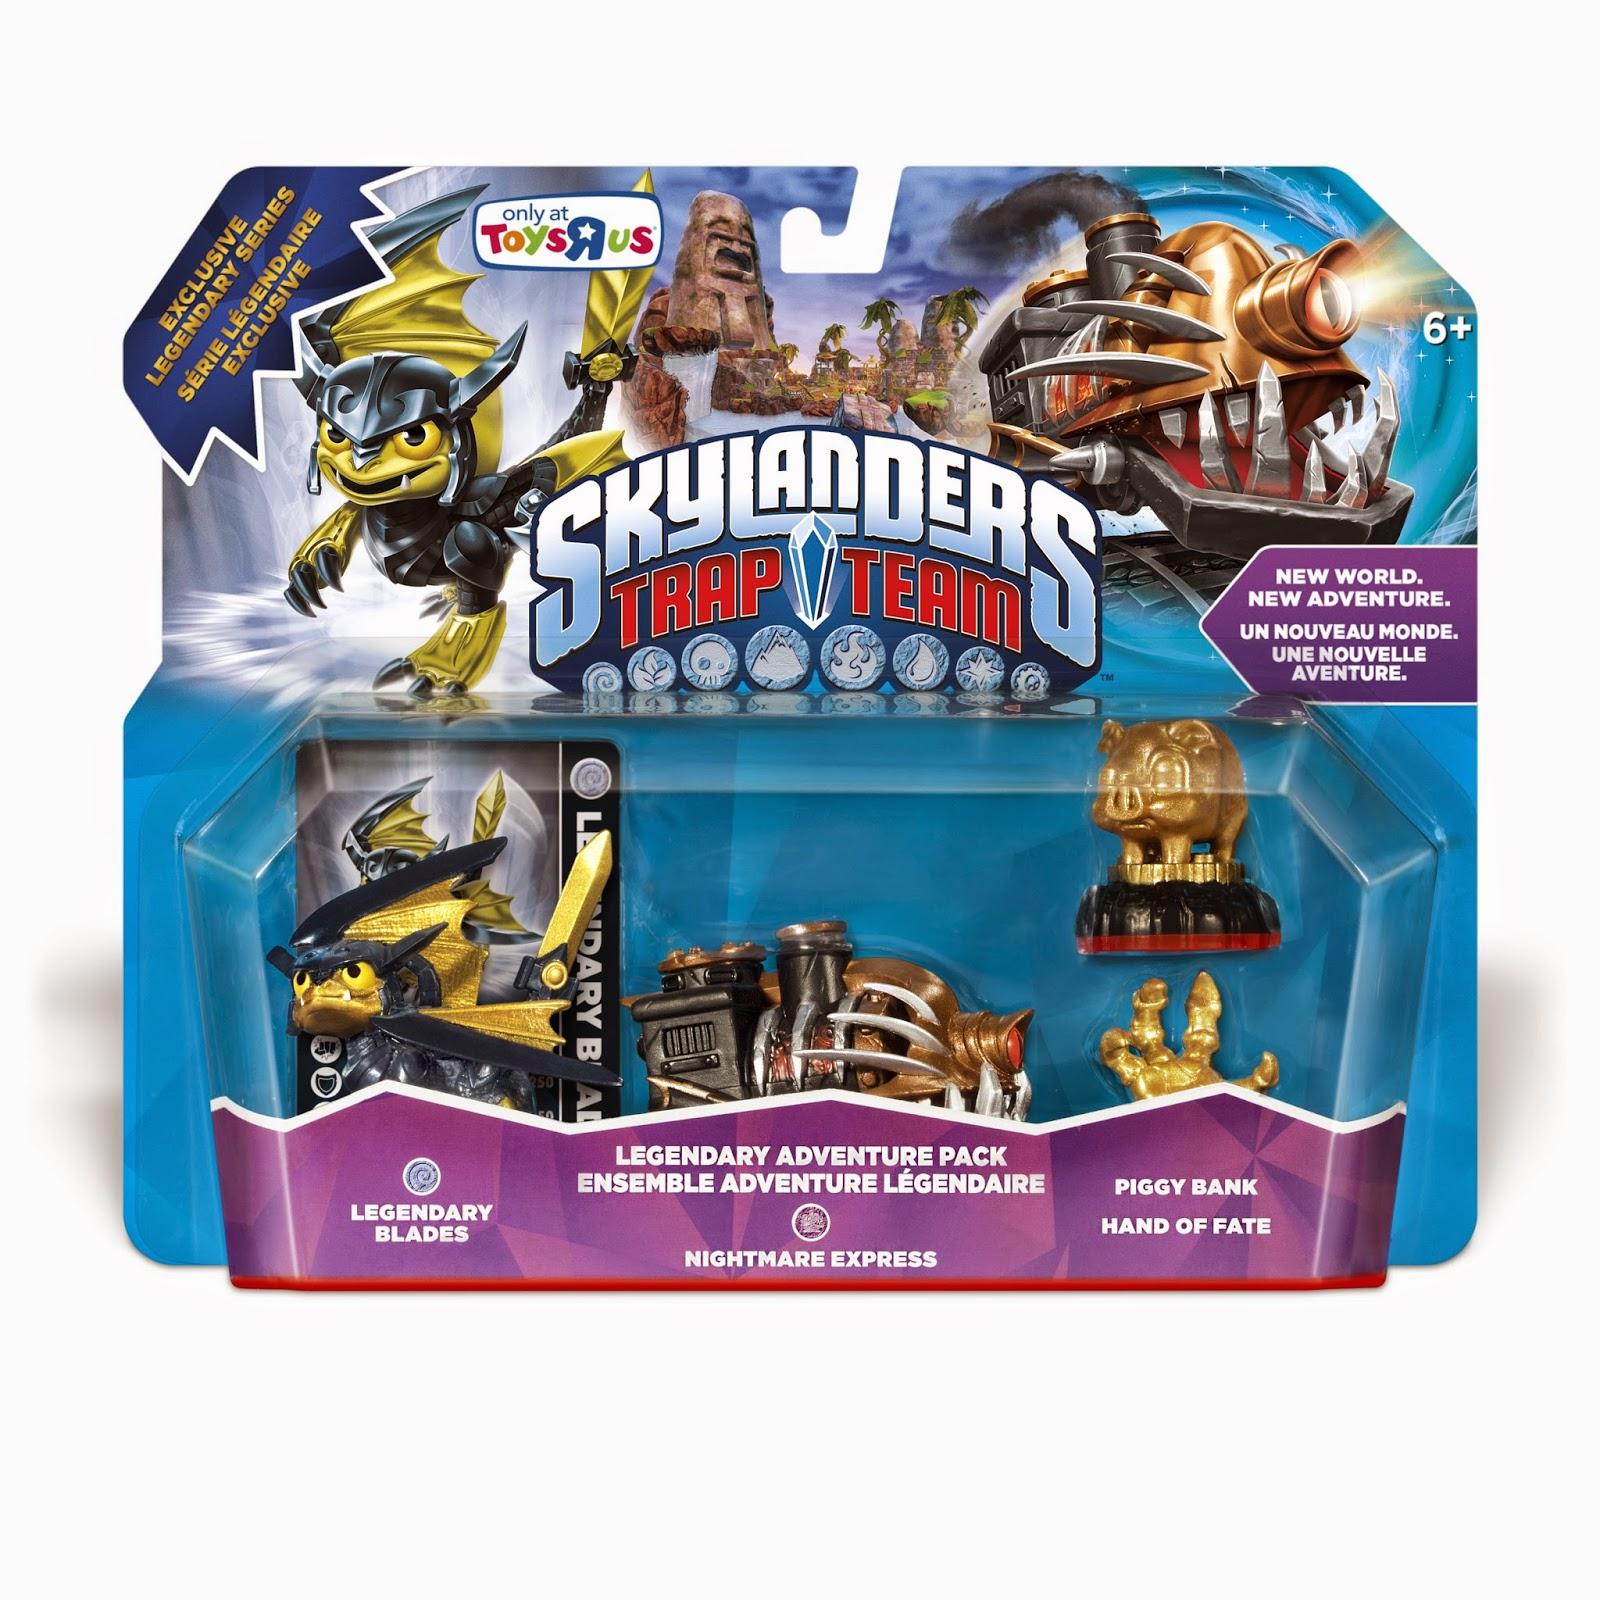 Skylanders Toys R Us : Toys quot r us announces legendary pre order for skylanders